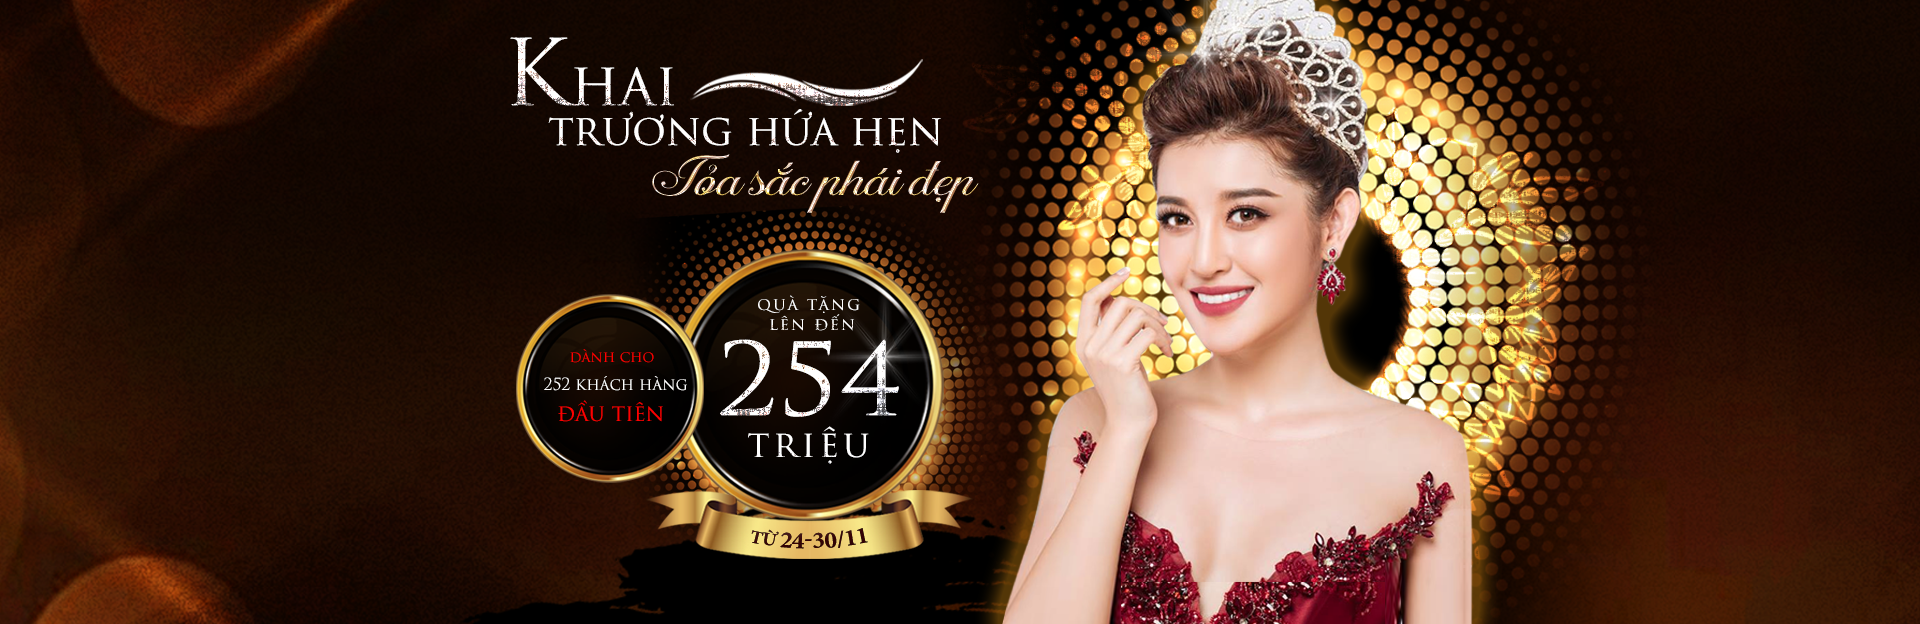 Banner tong thang 9-2017